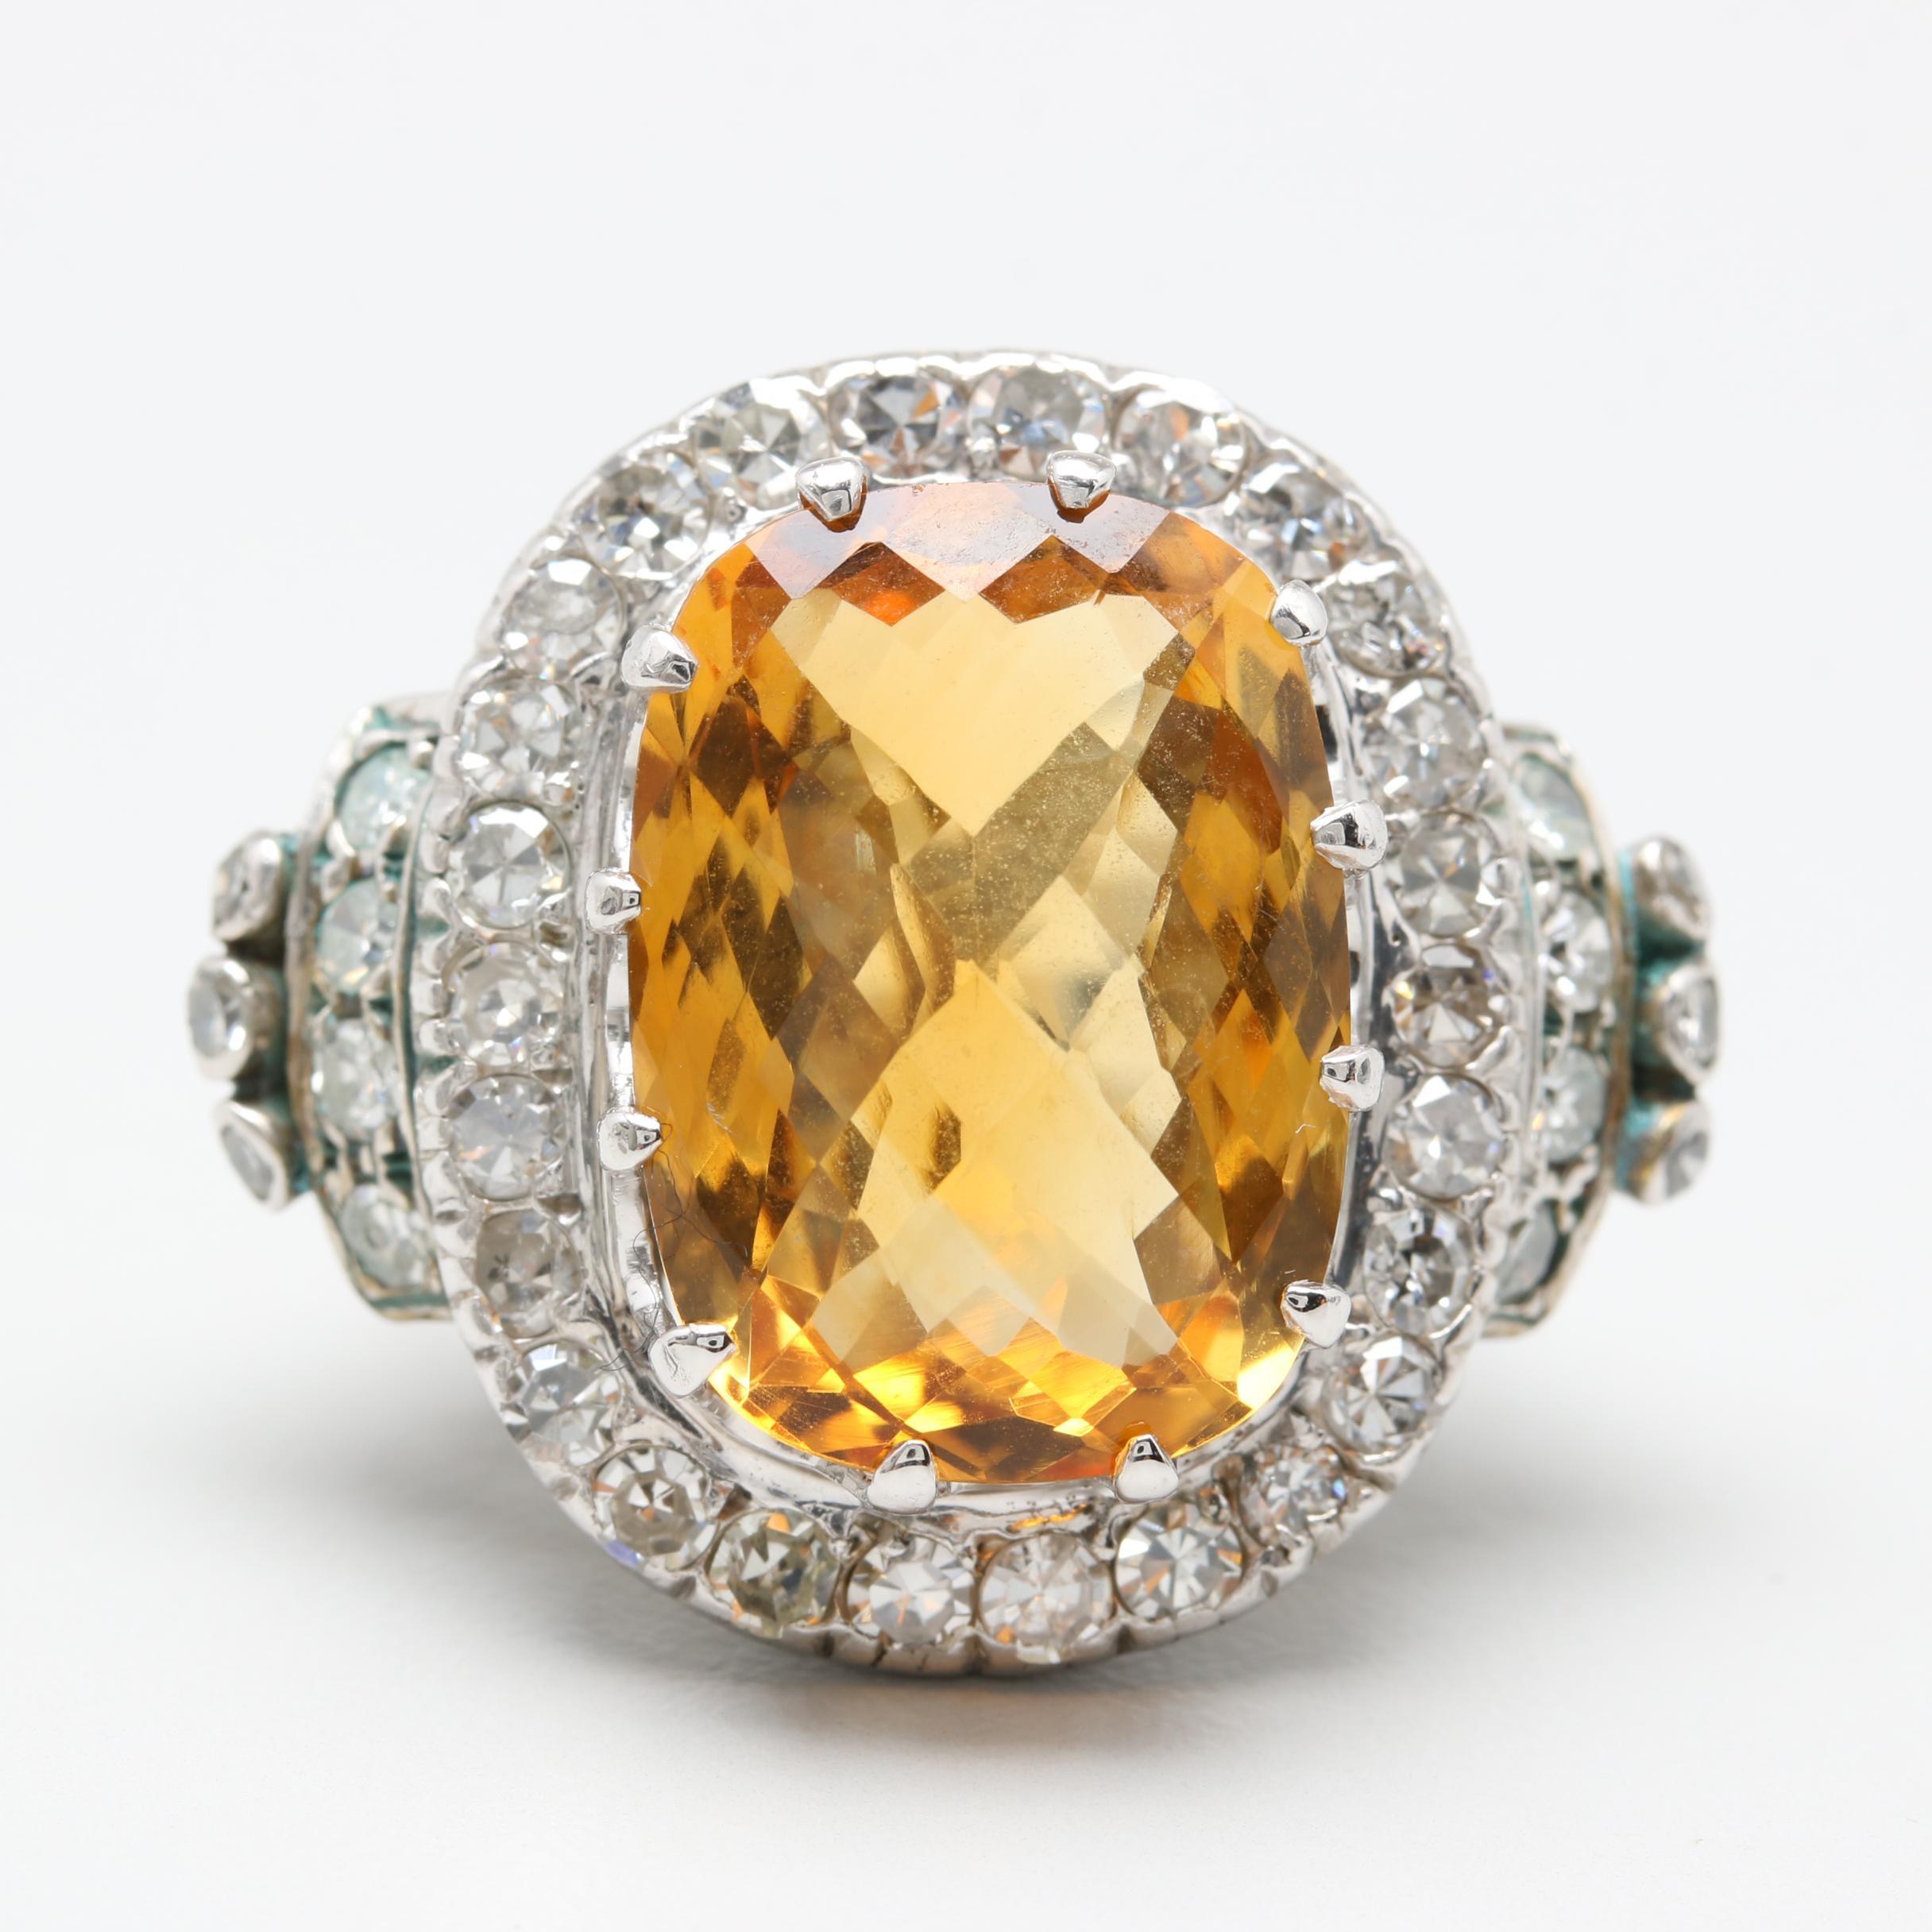 10K and 14K White Gold 12.44 CT Citrine and 1.57 CTW Diamond Ring